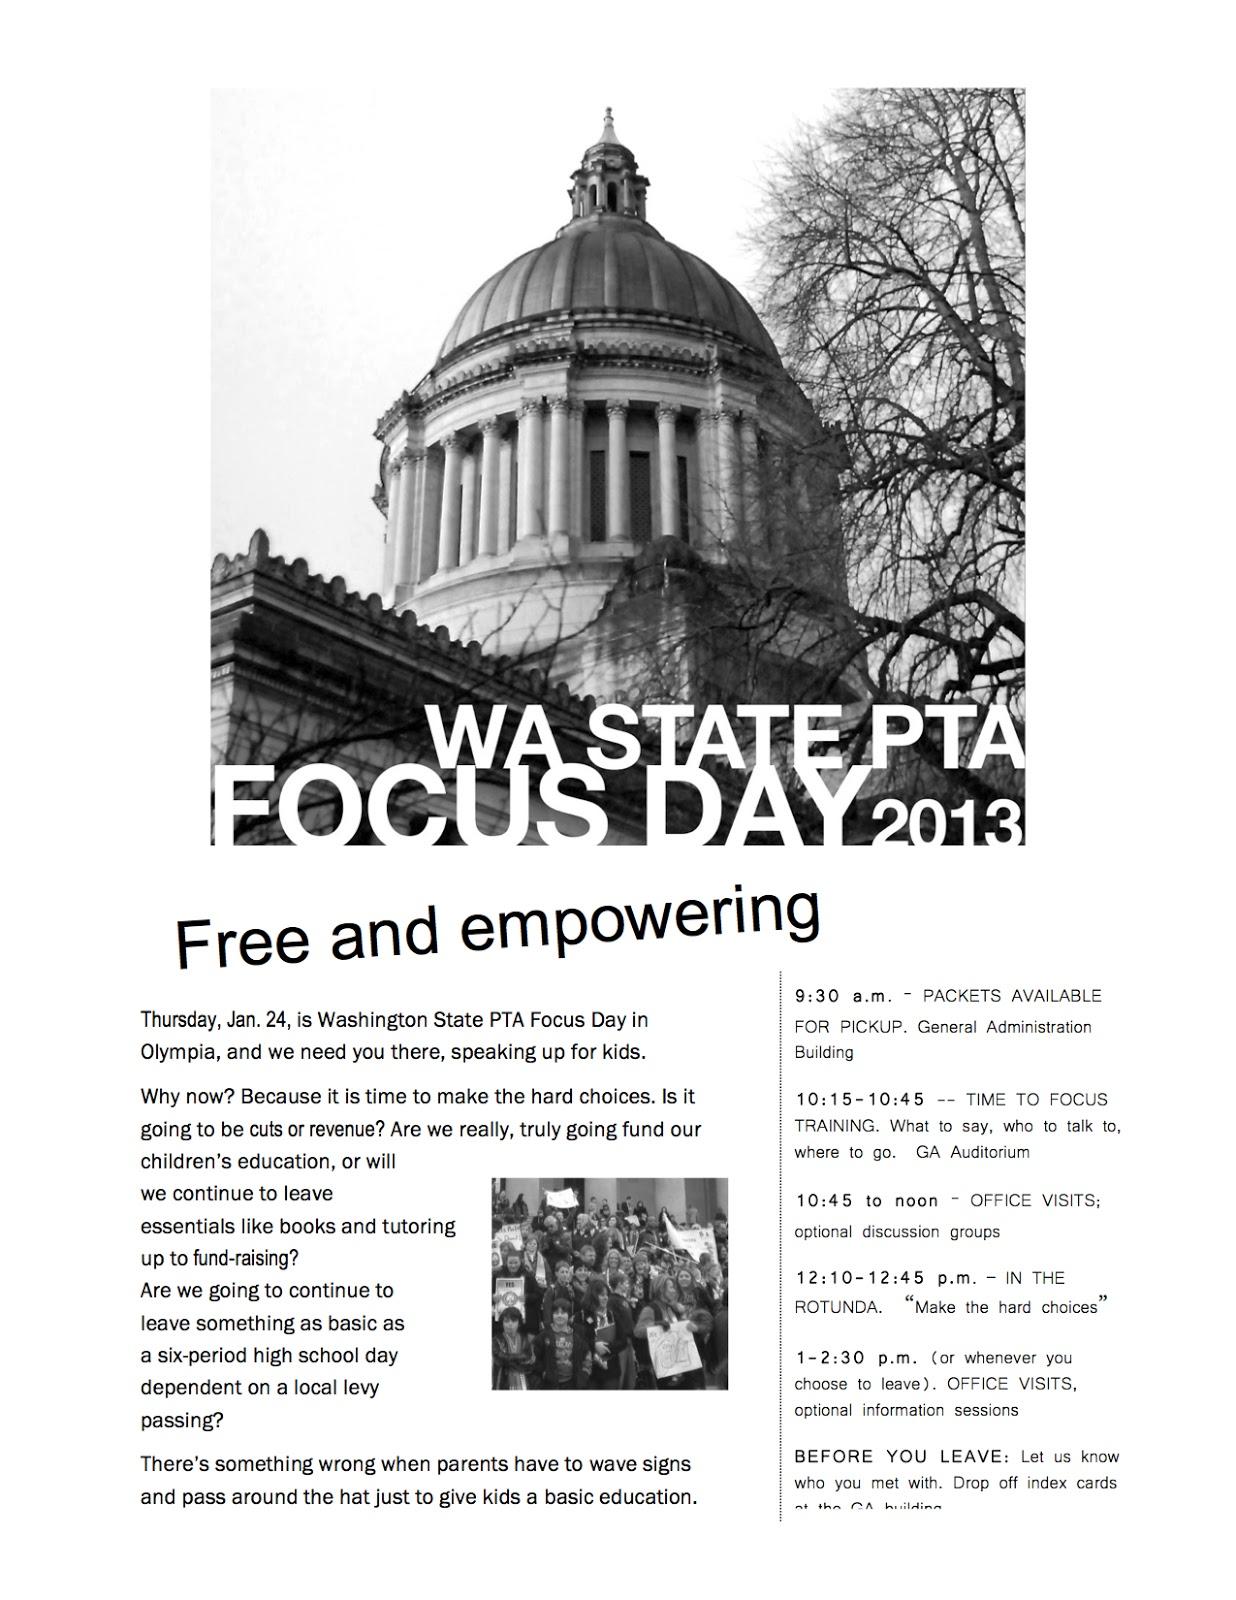 WSPTA Focus Day: Updated printable flyer